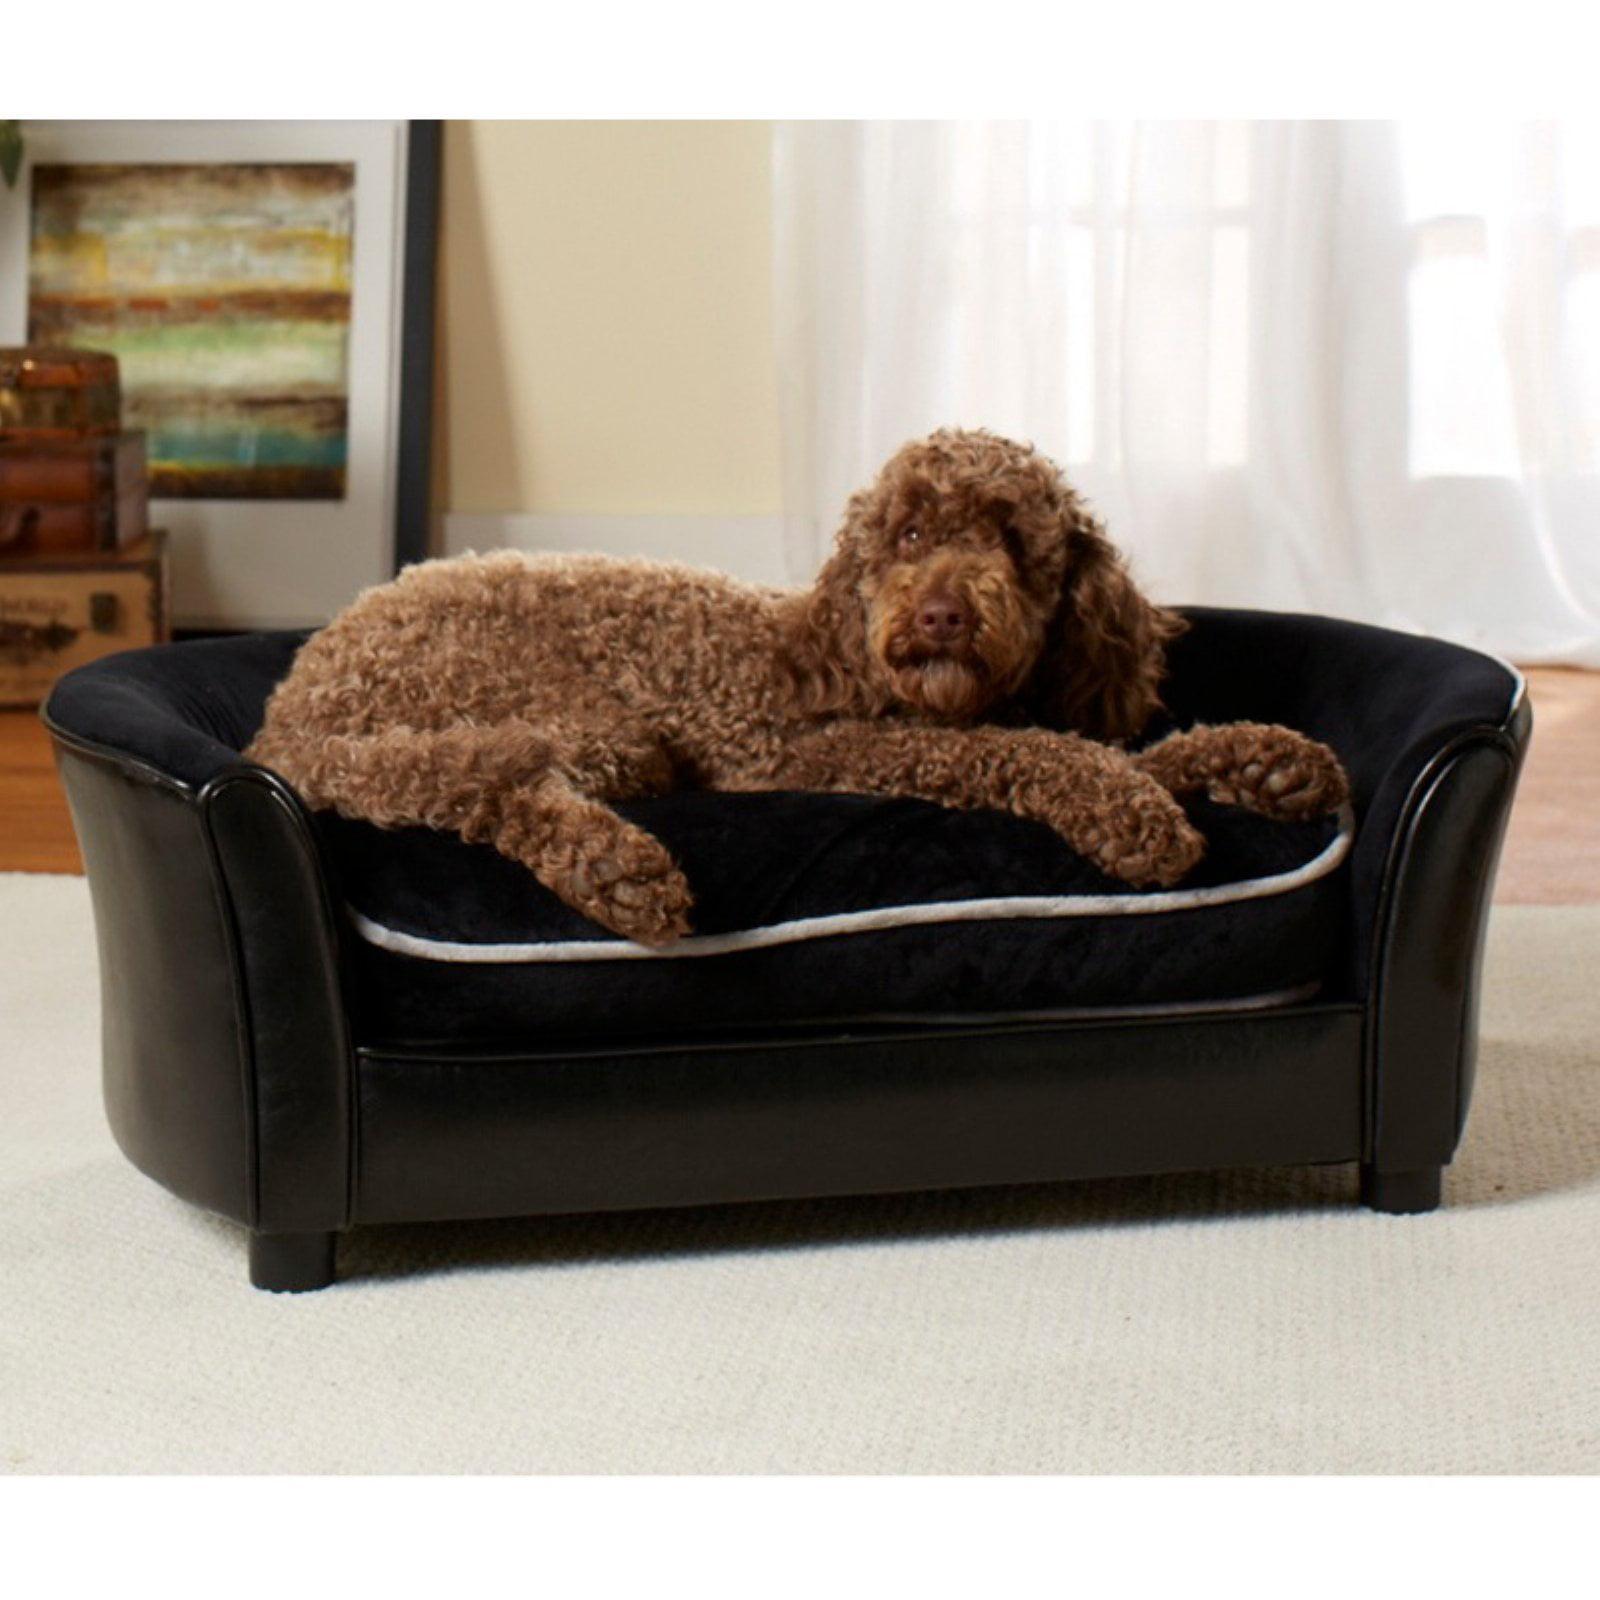 Enchanted Home Pet Ultra Plush Panache Sofa Pet Bed Black